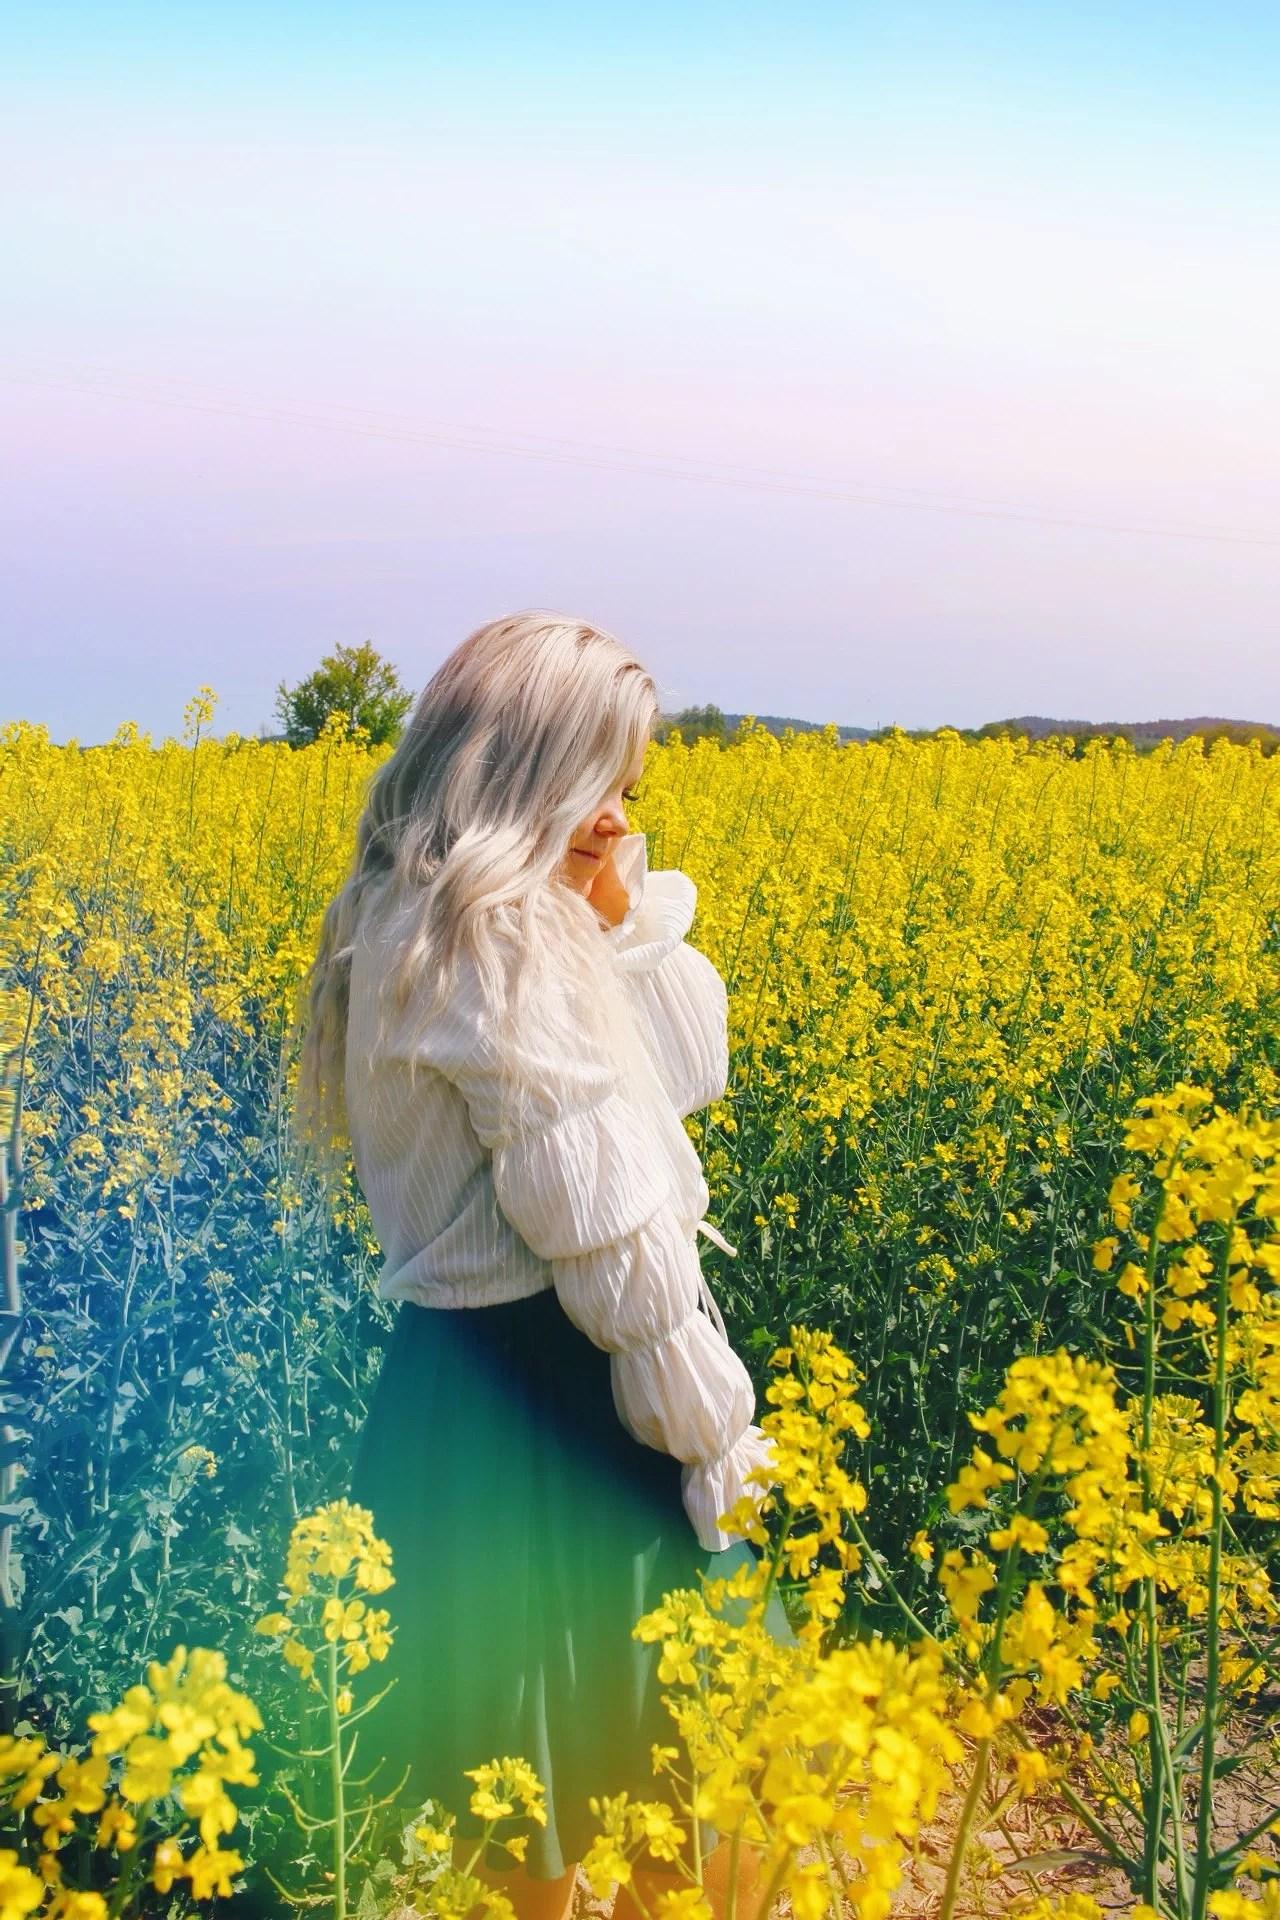 dancing in a yellow dream